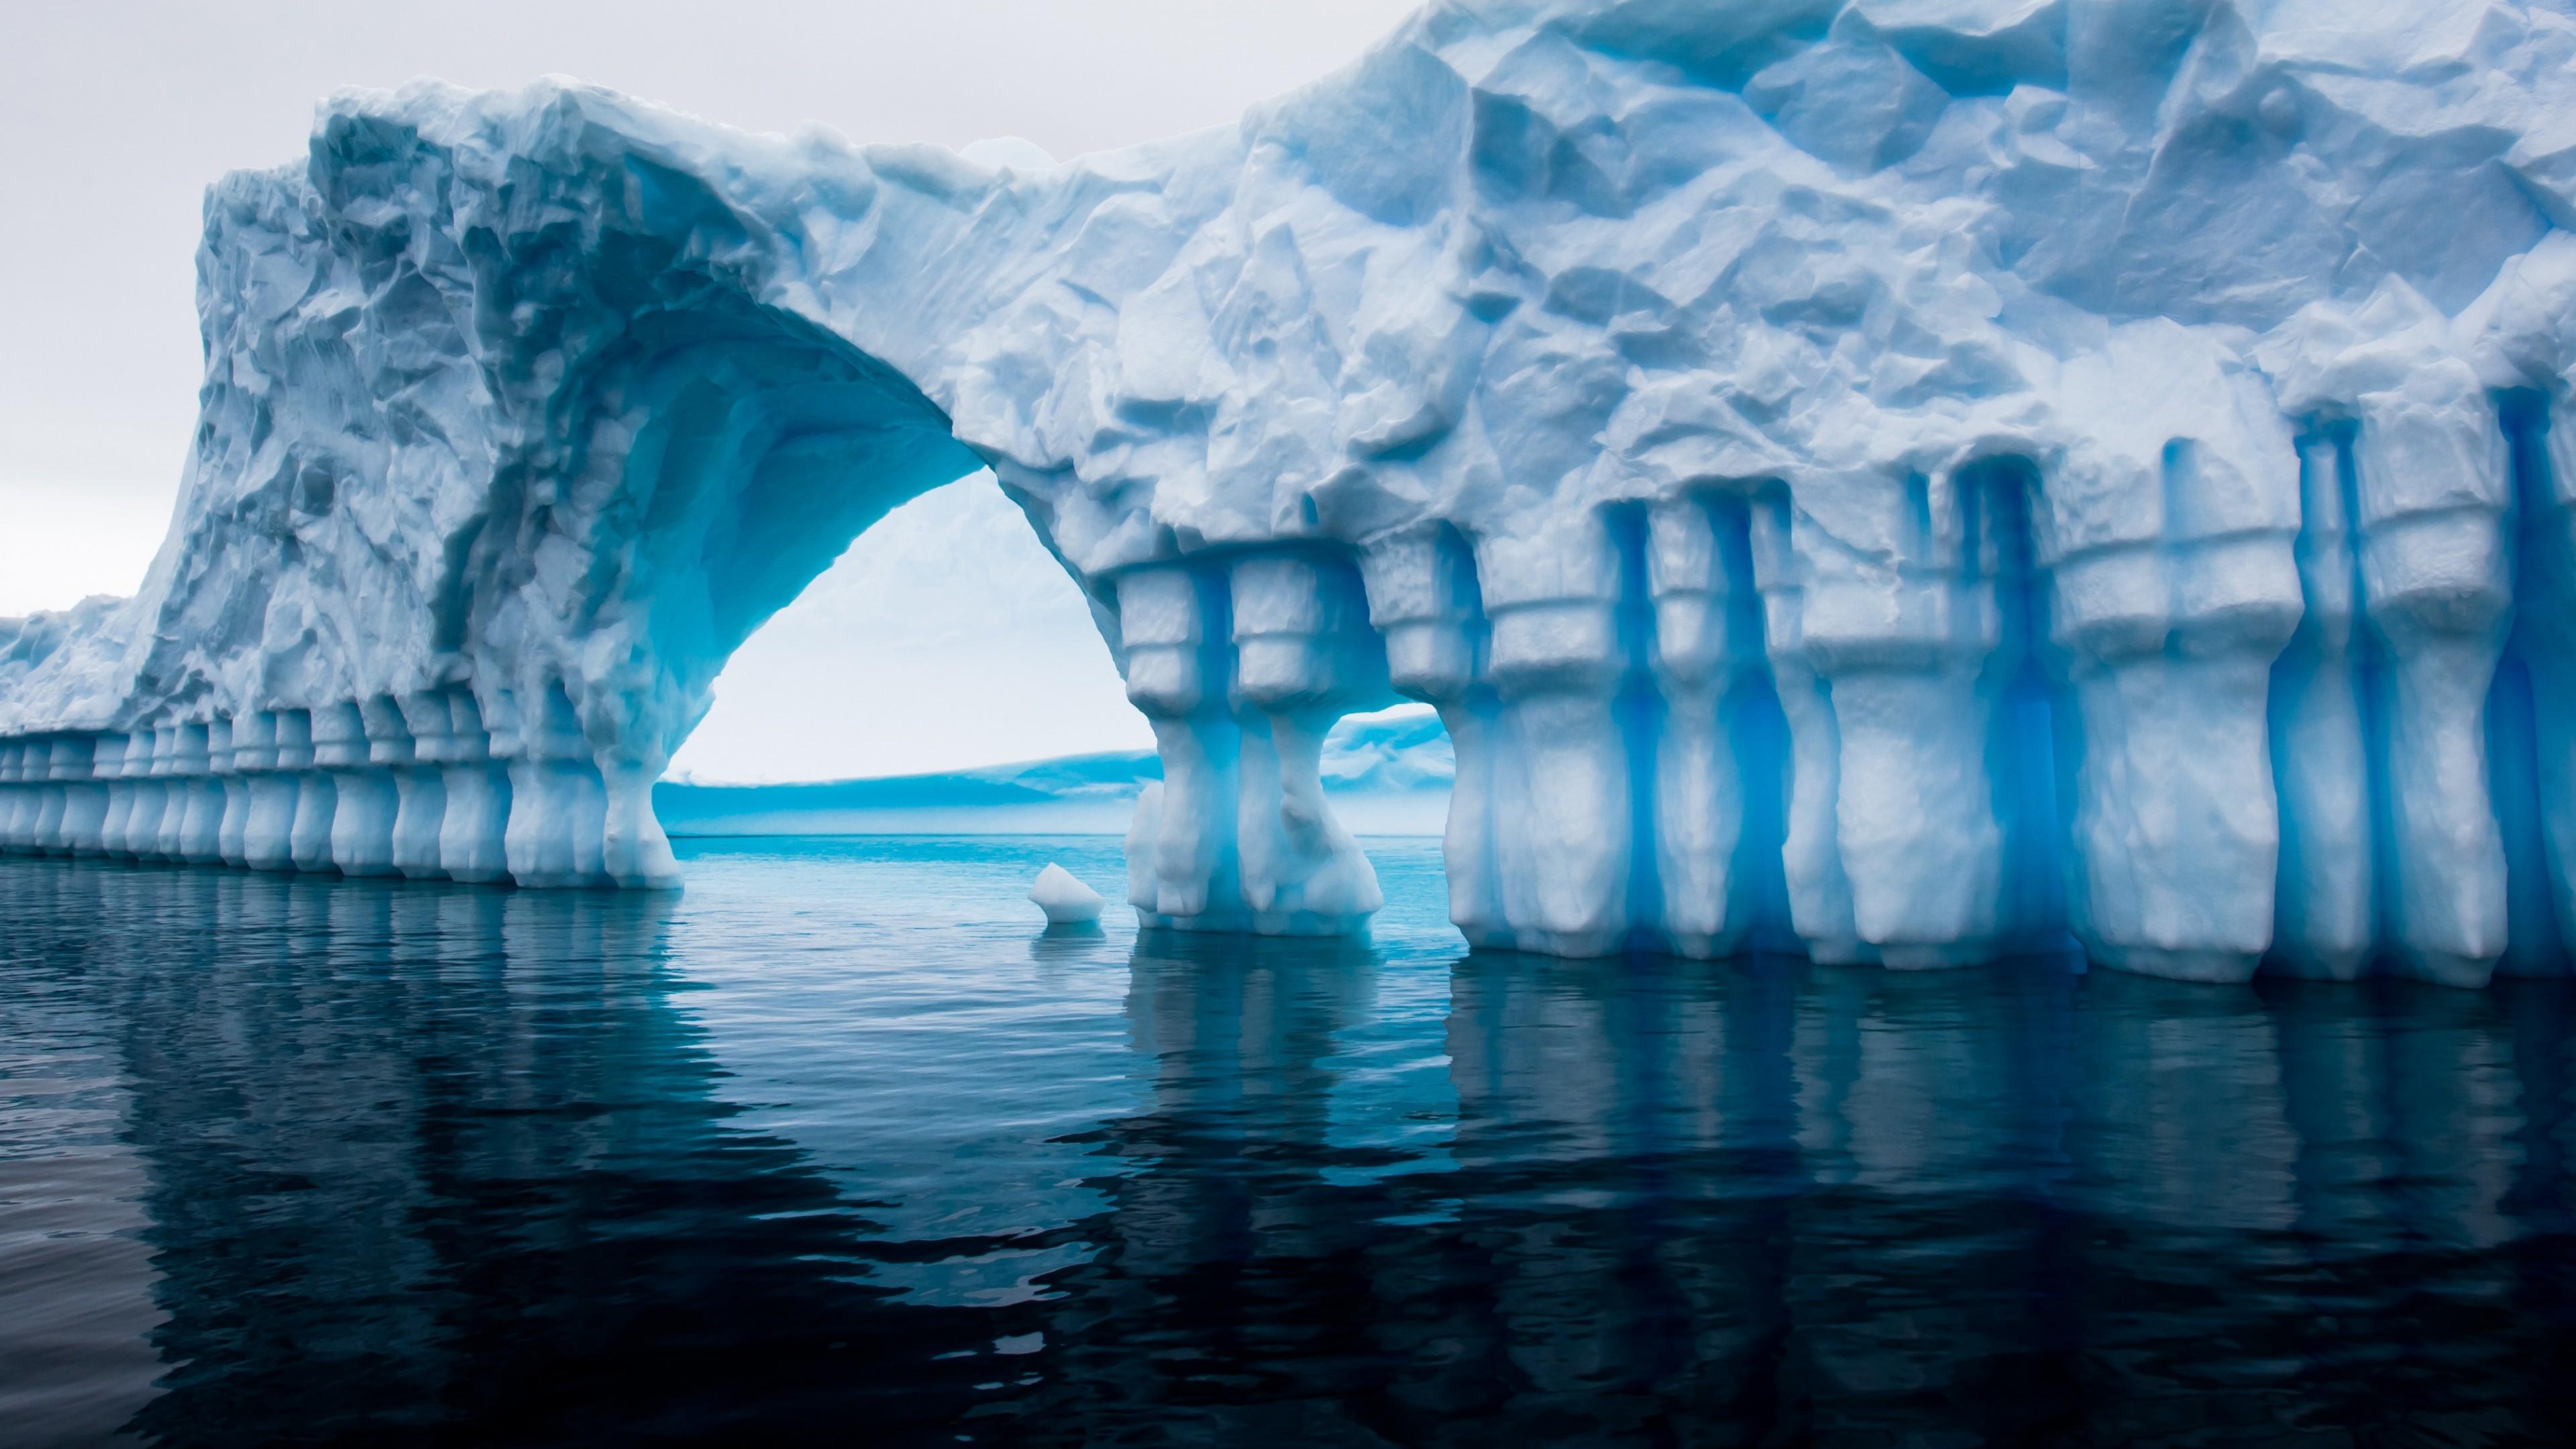 Wallpaper Antarctica 5k 4k wallpaper iceberg blue water 3840x2160